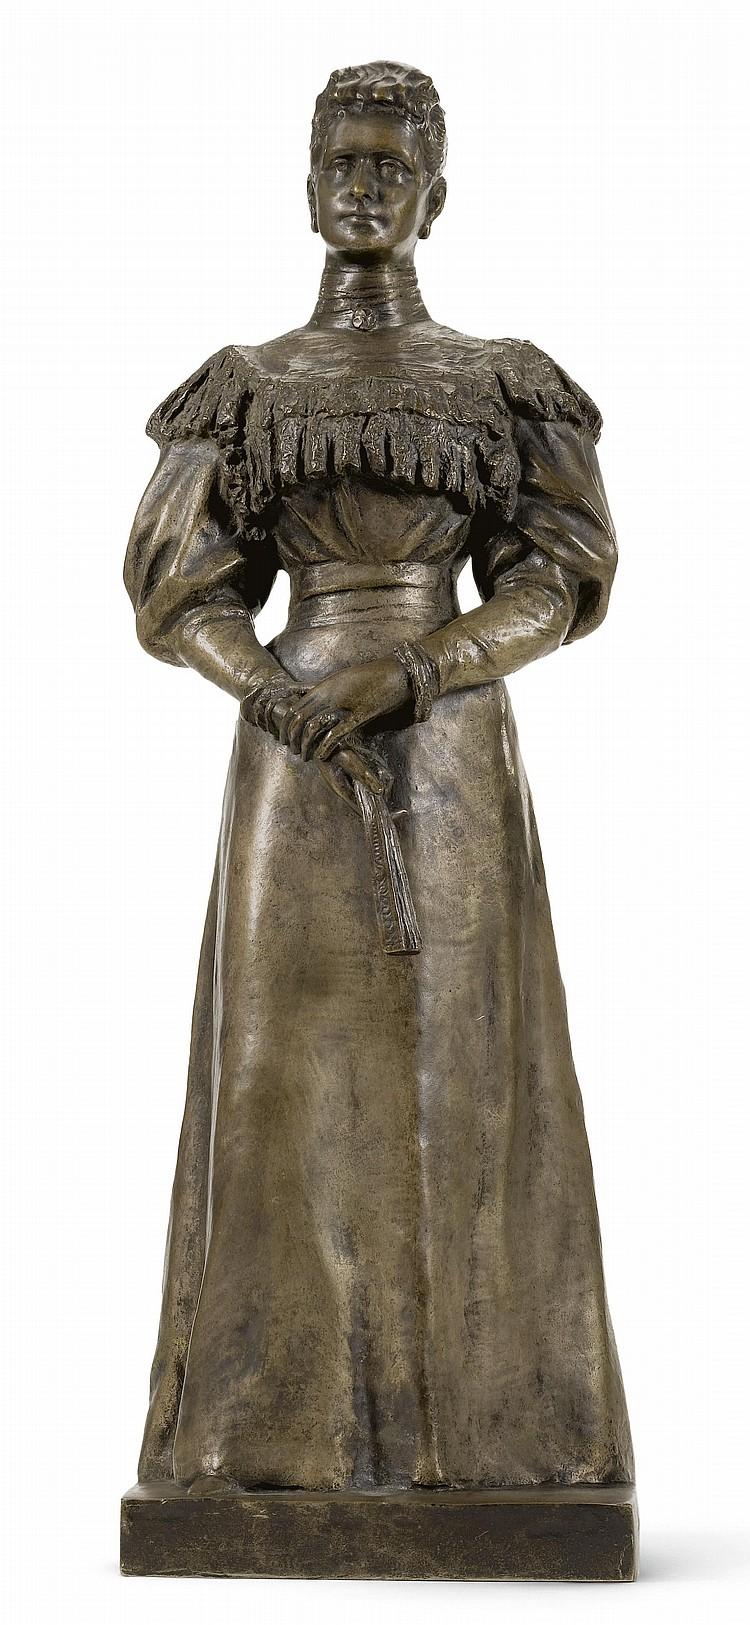 leopold-bernstamm - empress-alexandra-bronze-statue-bernstamm-1